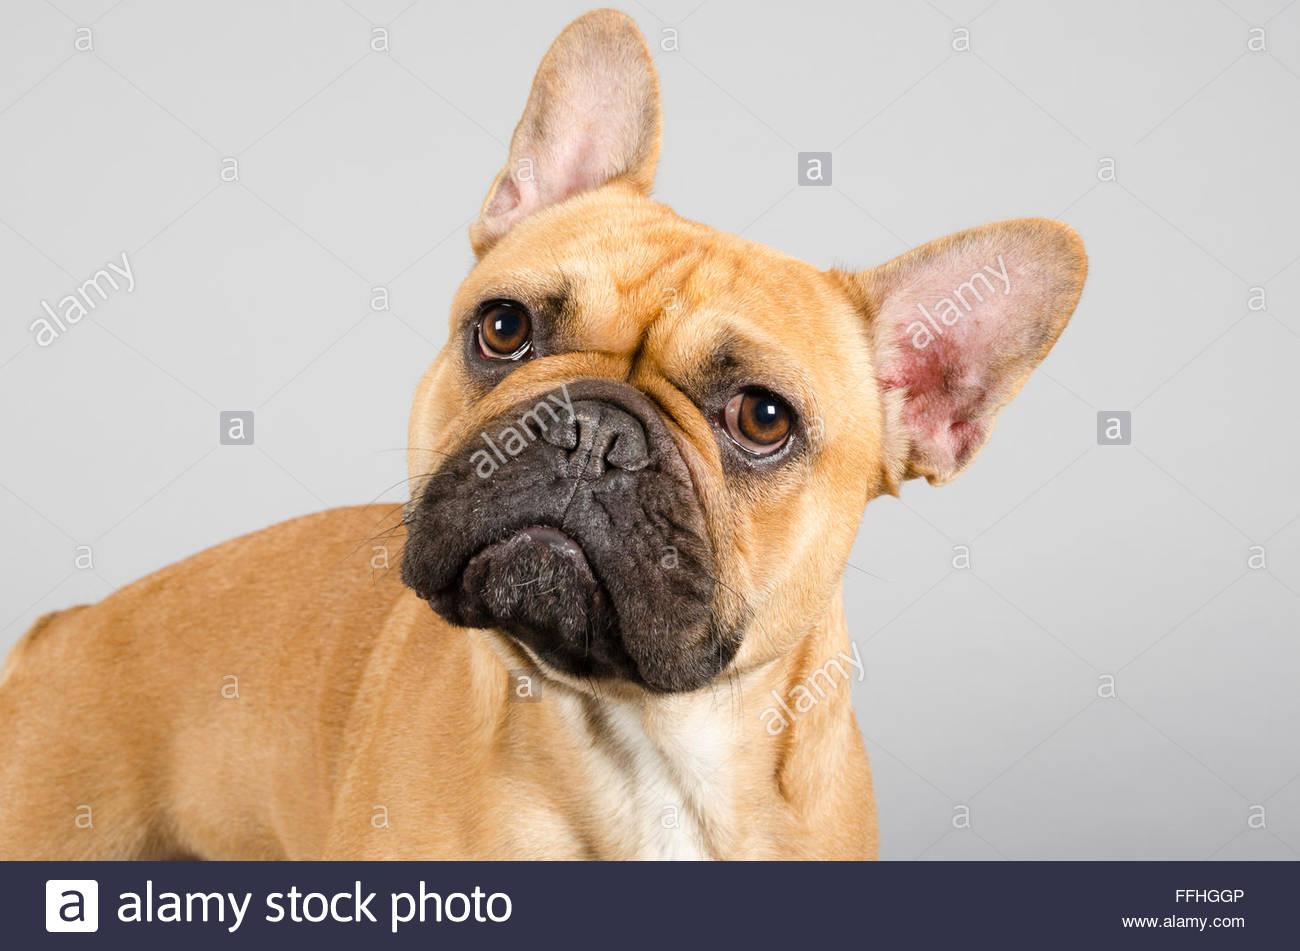 French bulldog called Duke - Stock Image